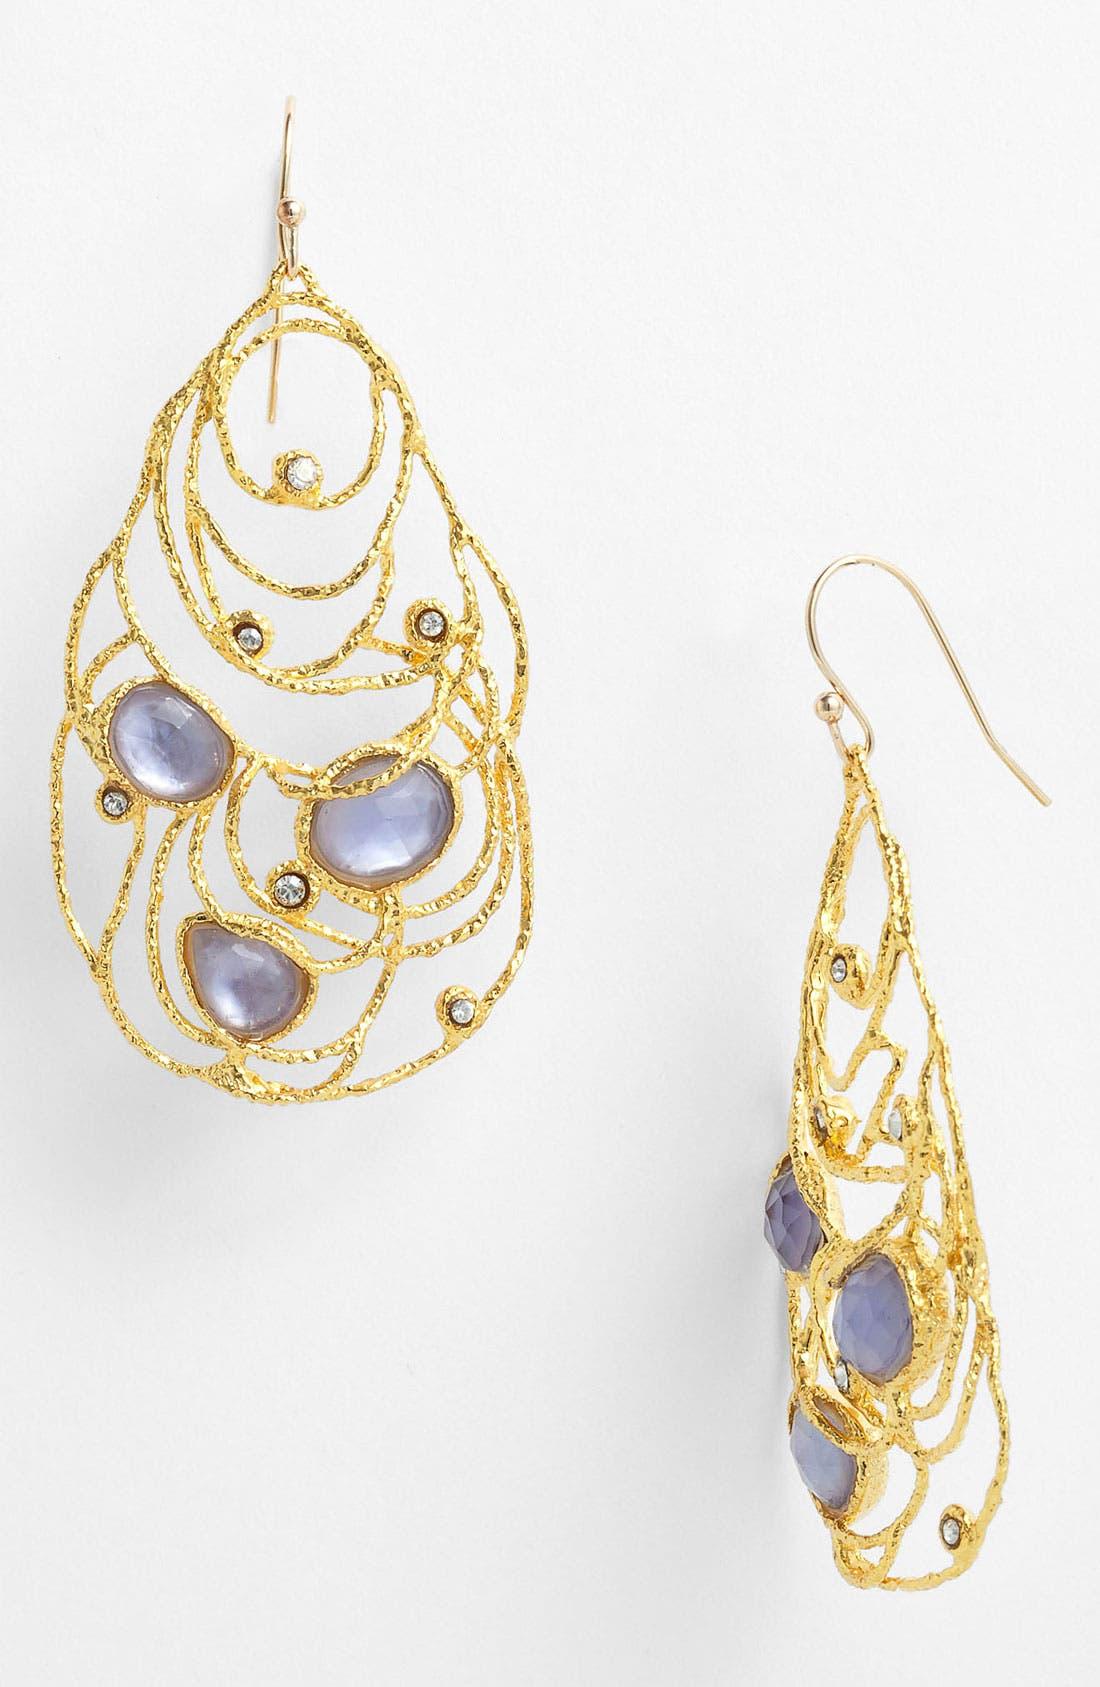 Alternate Image 1 Selected - Alexis Bittar 'Elements - Mauritius' Open Drop Earrings